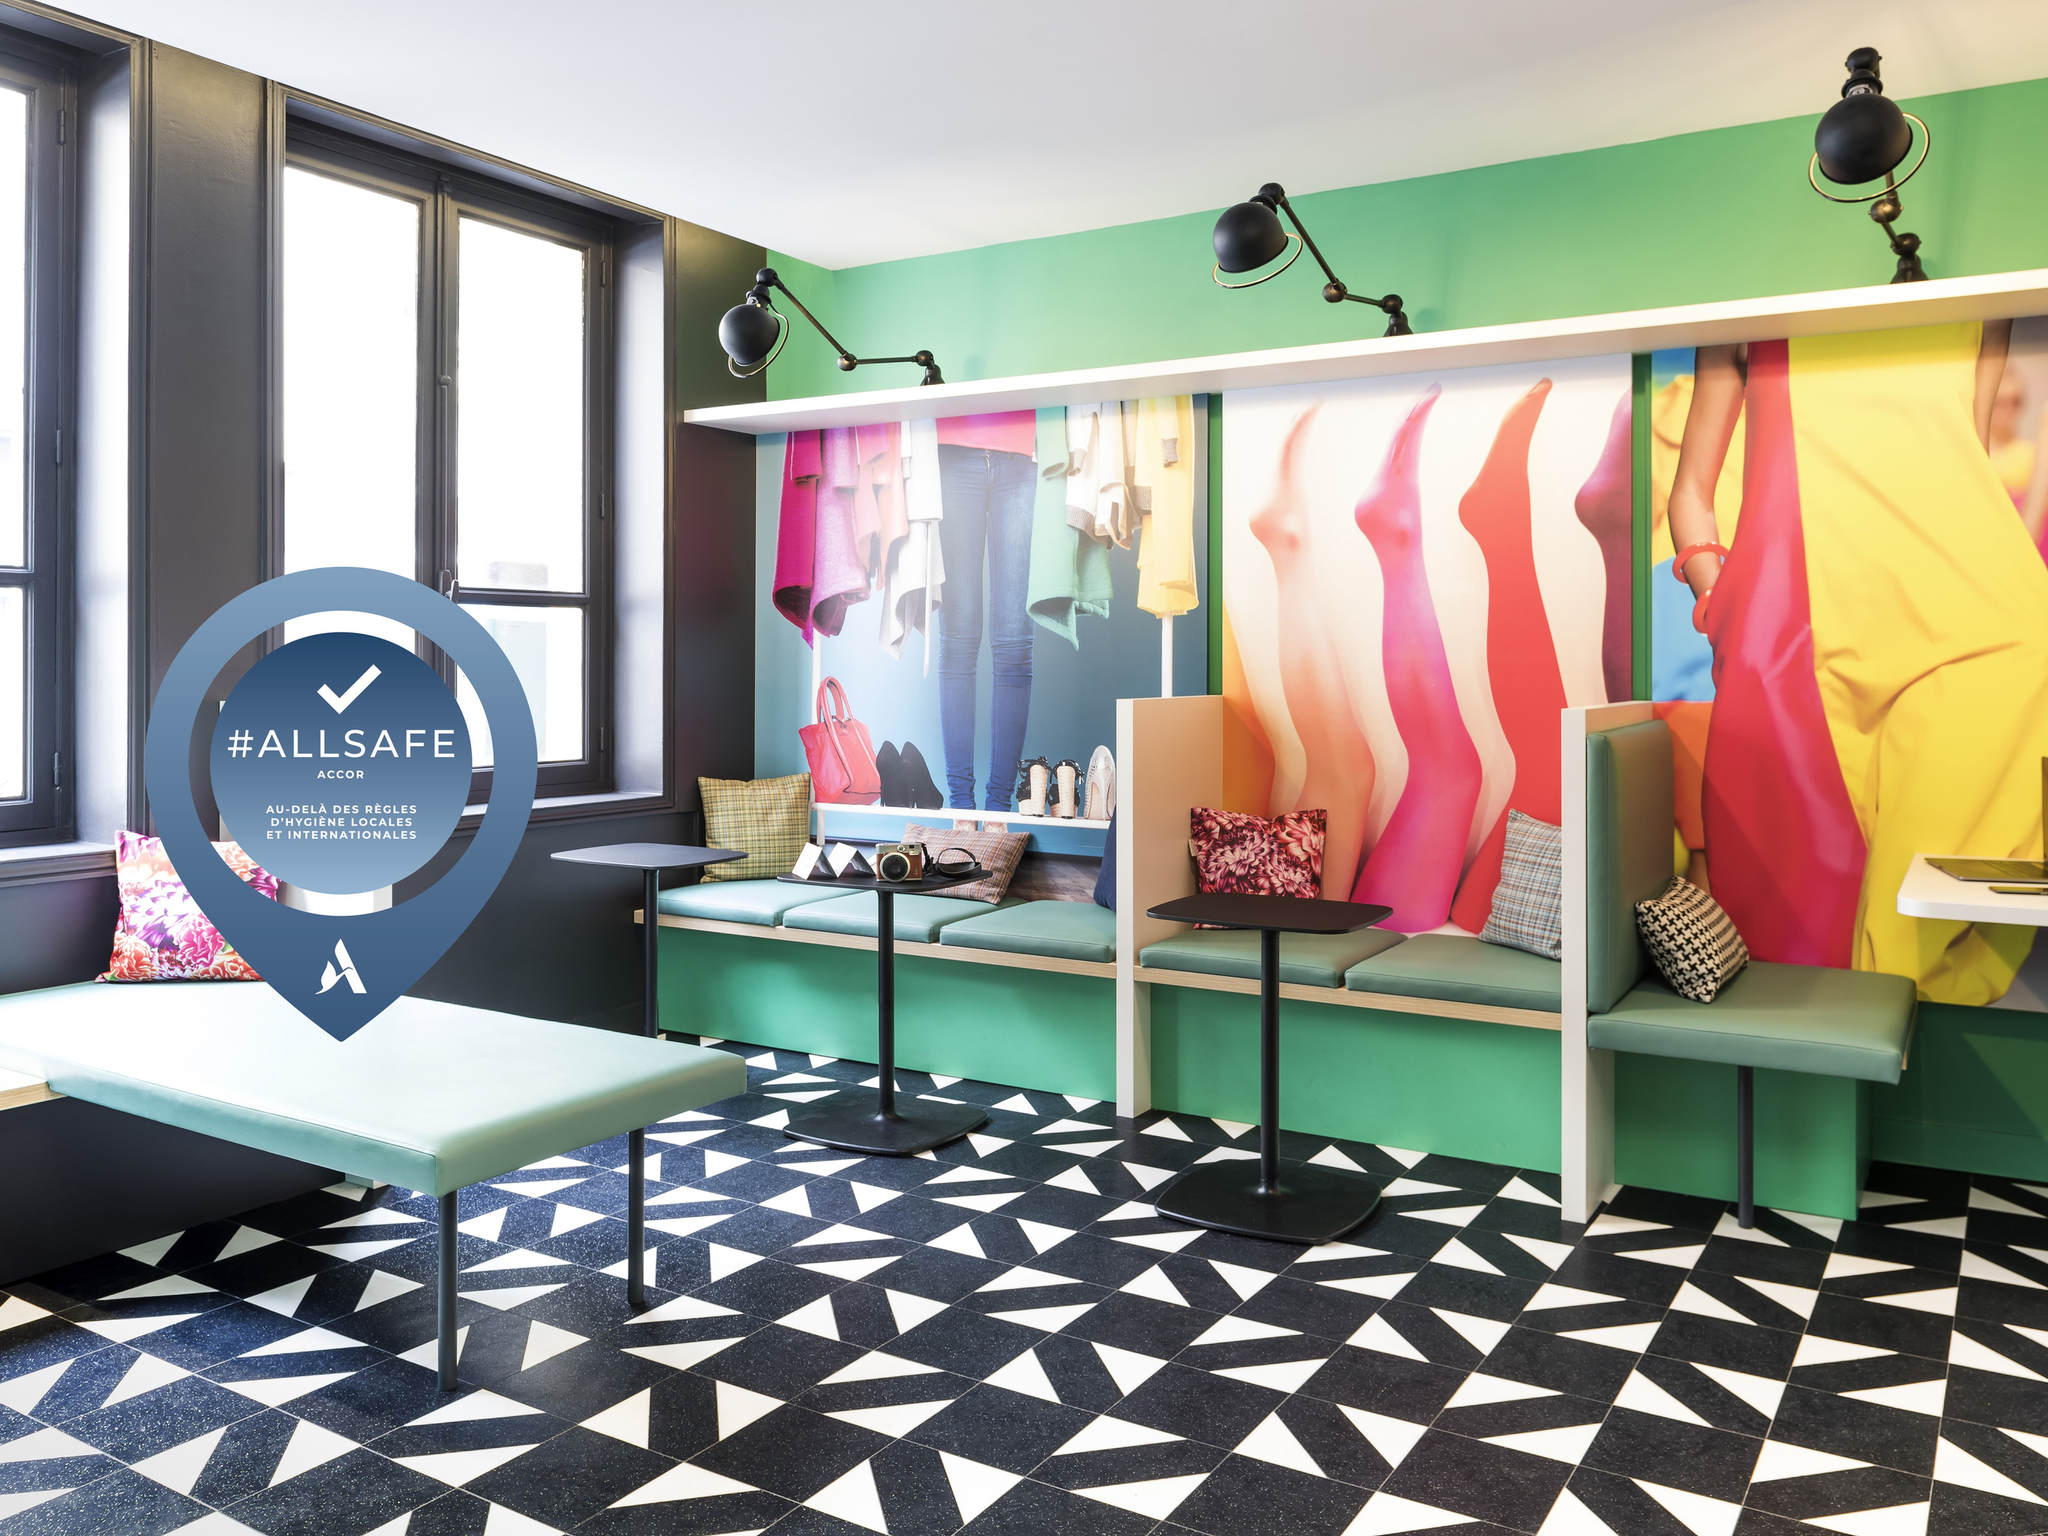 فندق - إيبيس ستايلز Ibis Styles باريس جار سان لازار